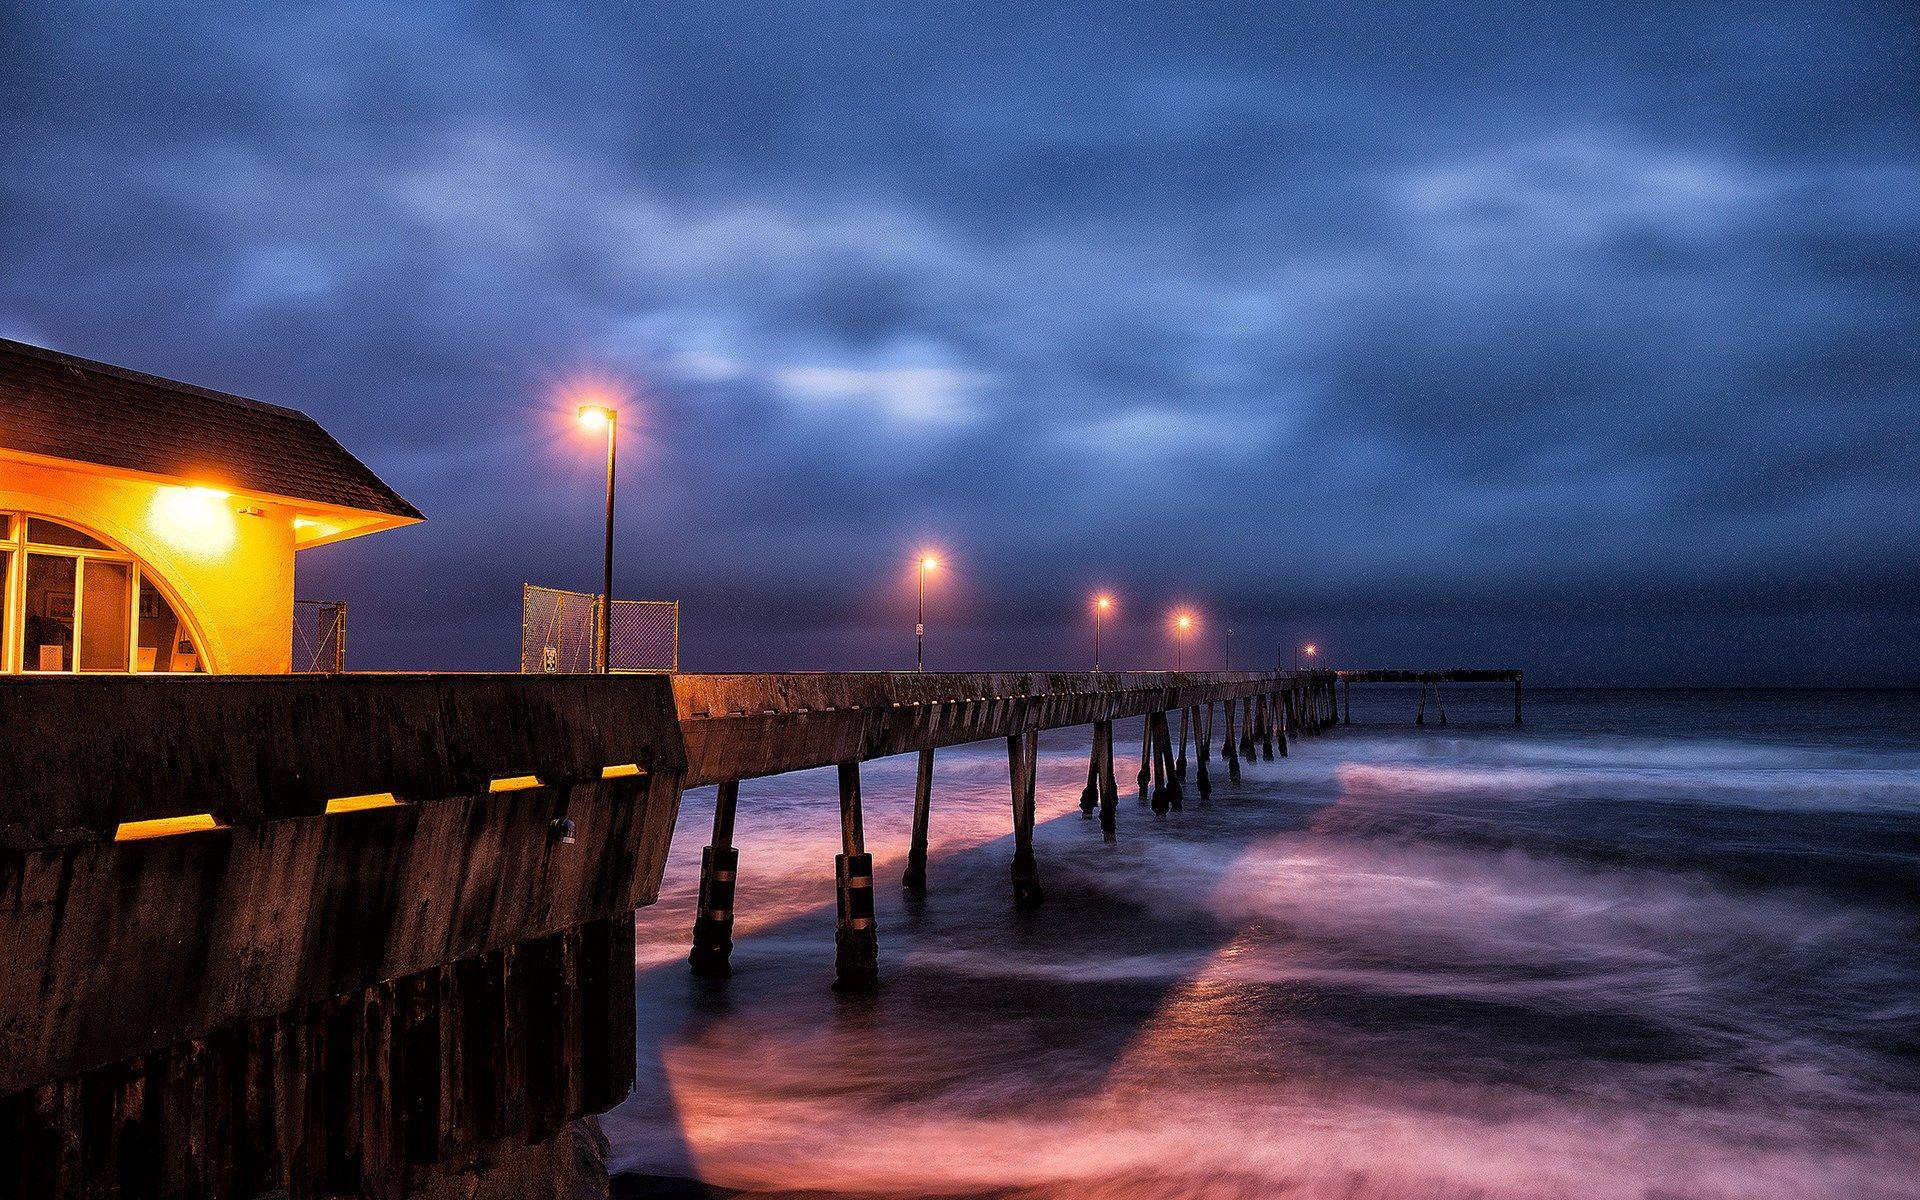 pier pictures for large desktop pier category